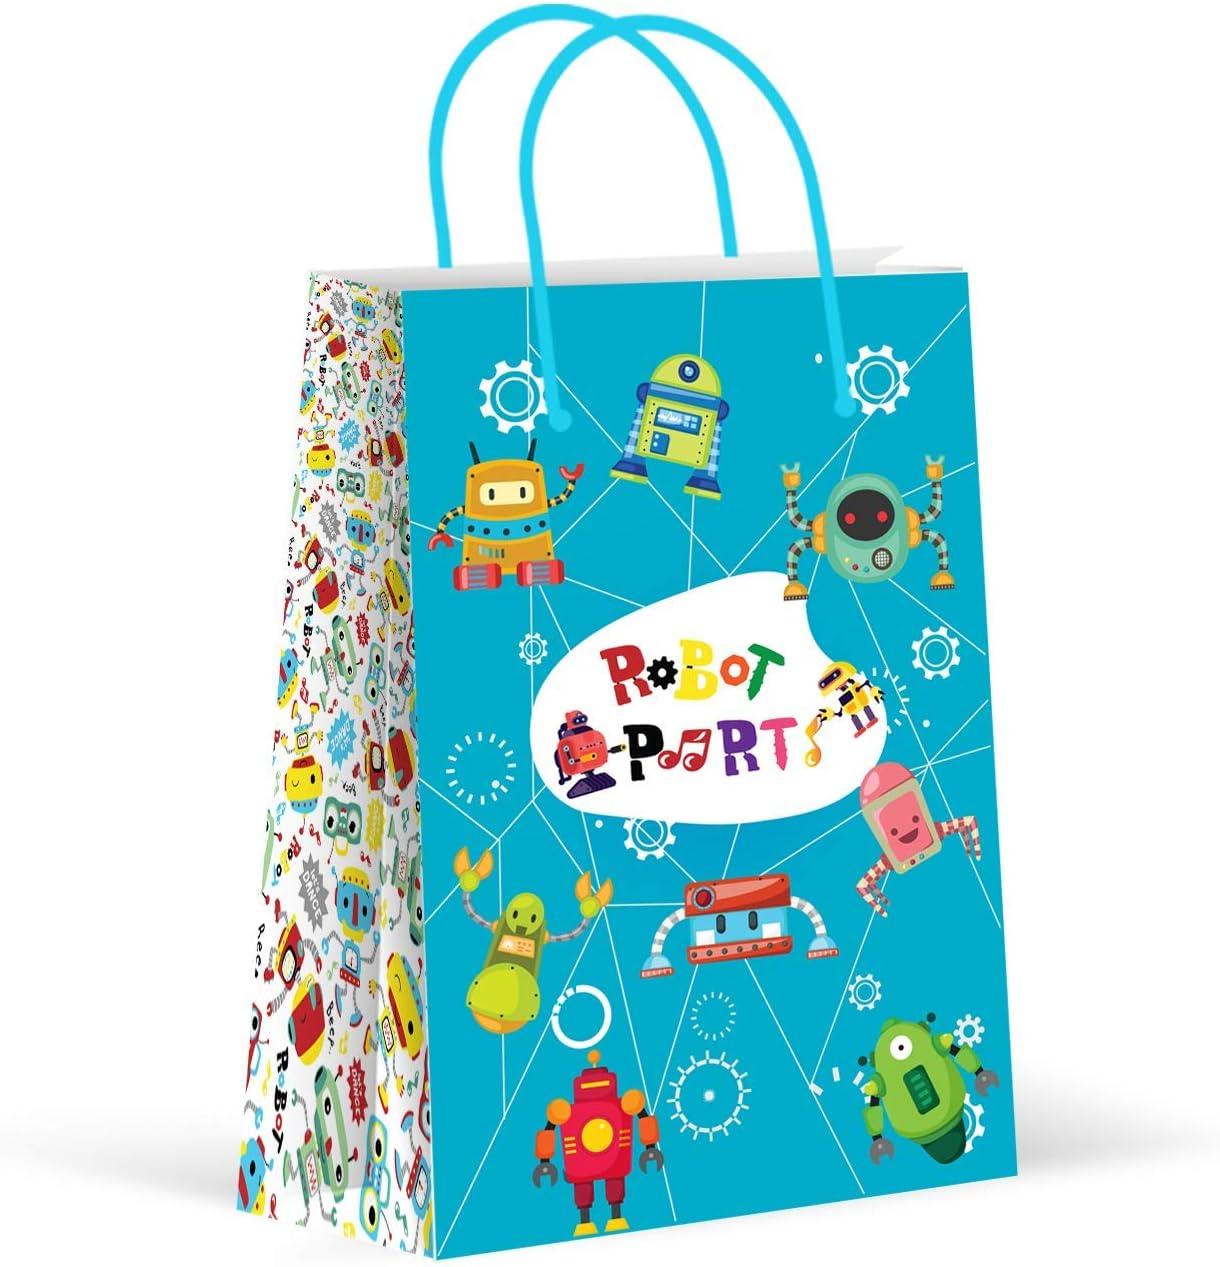 Premium Robot Party Bags, Party Favor Bags, New, Treat Bags, Gift Bags, Goody Bags, Party Favors, Party Supplies, Decorations, 12 Pack